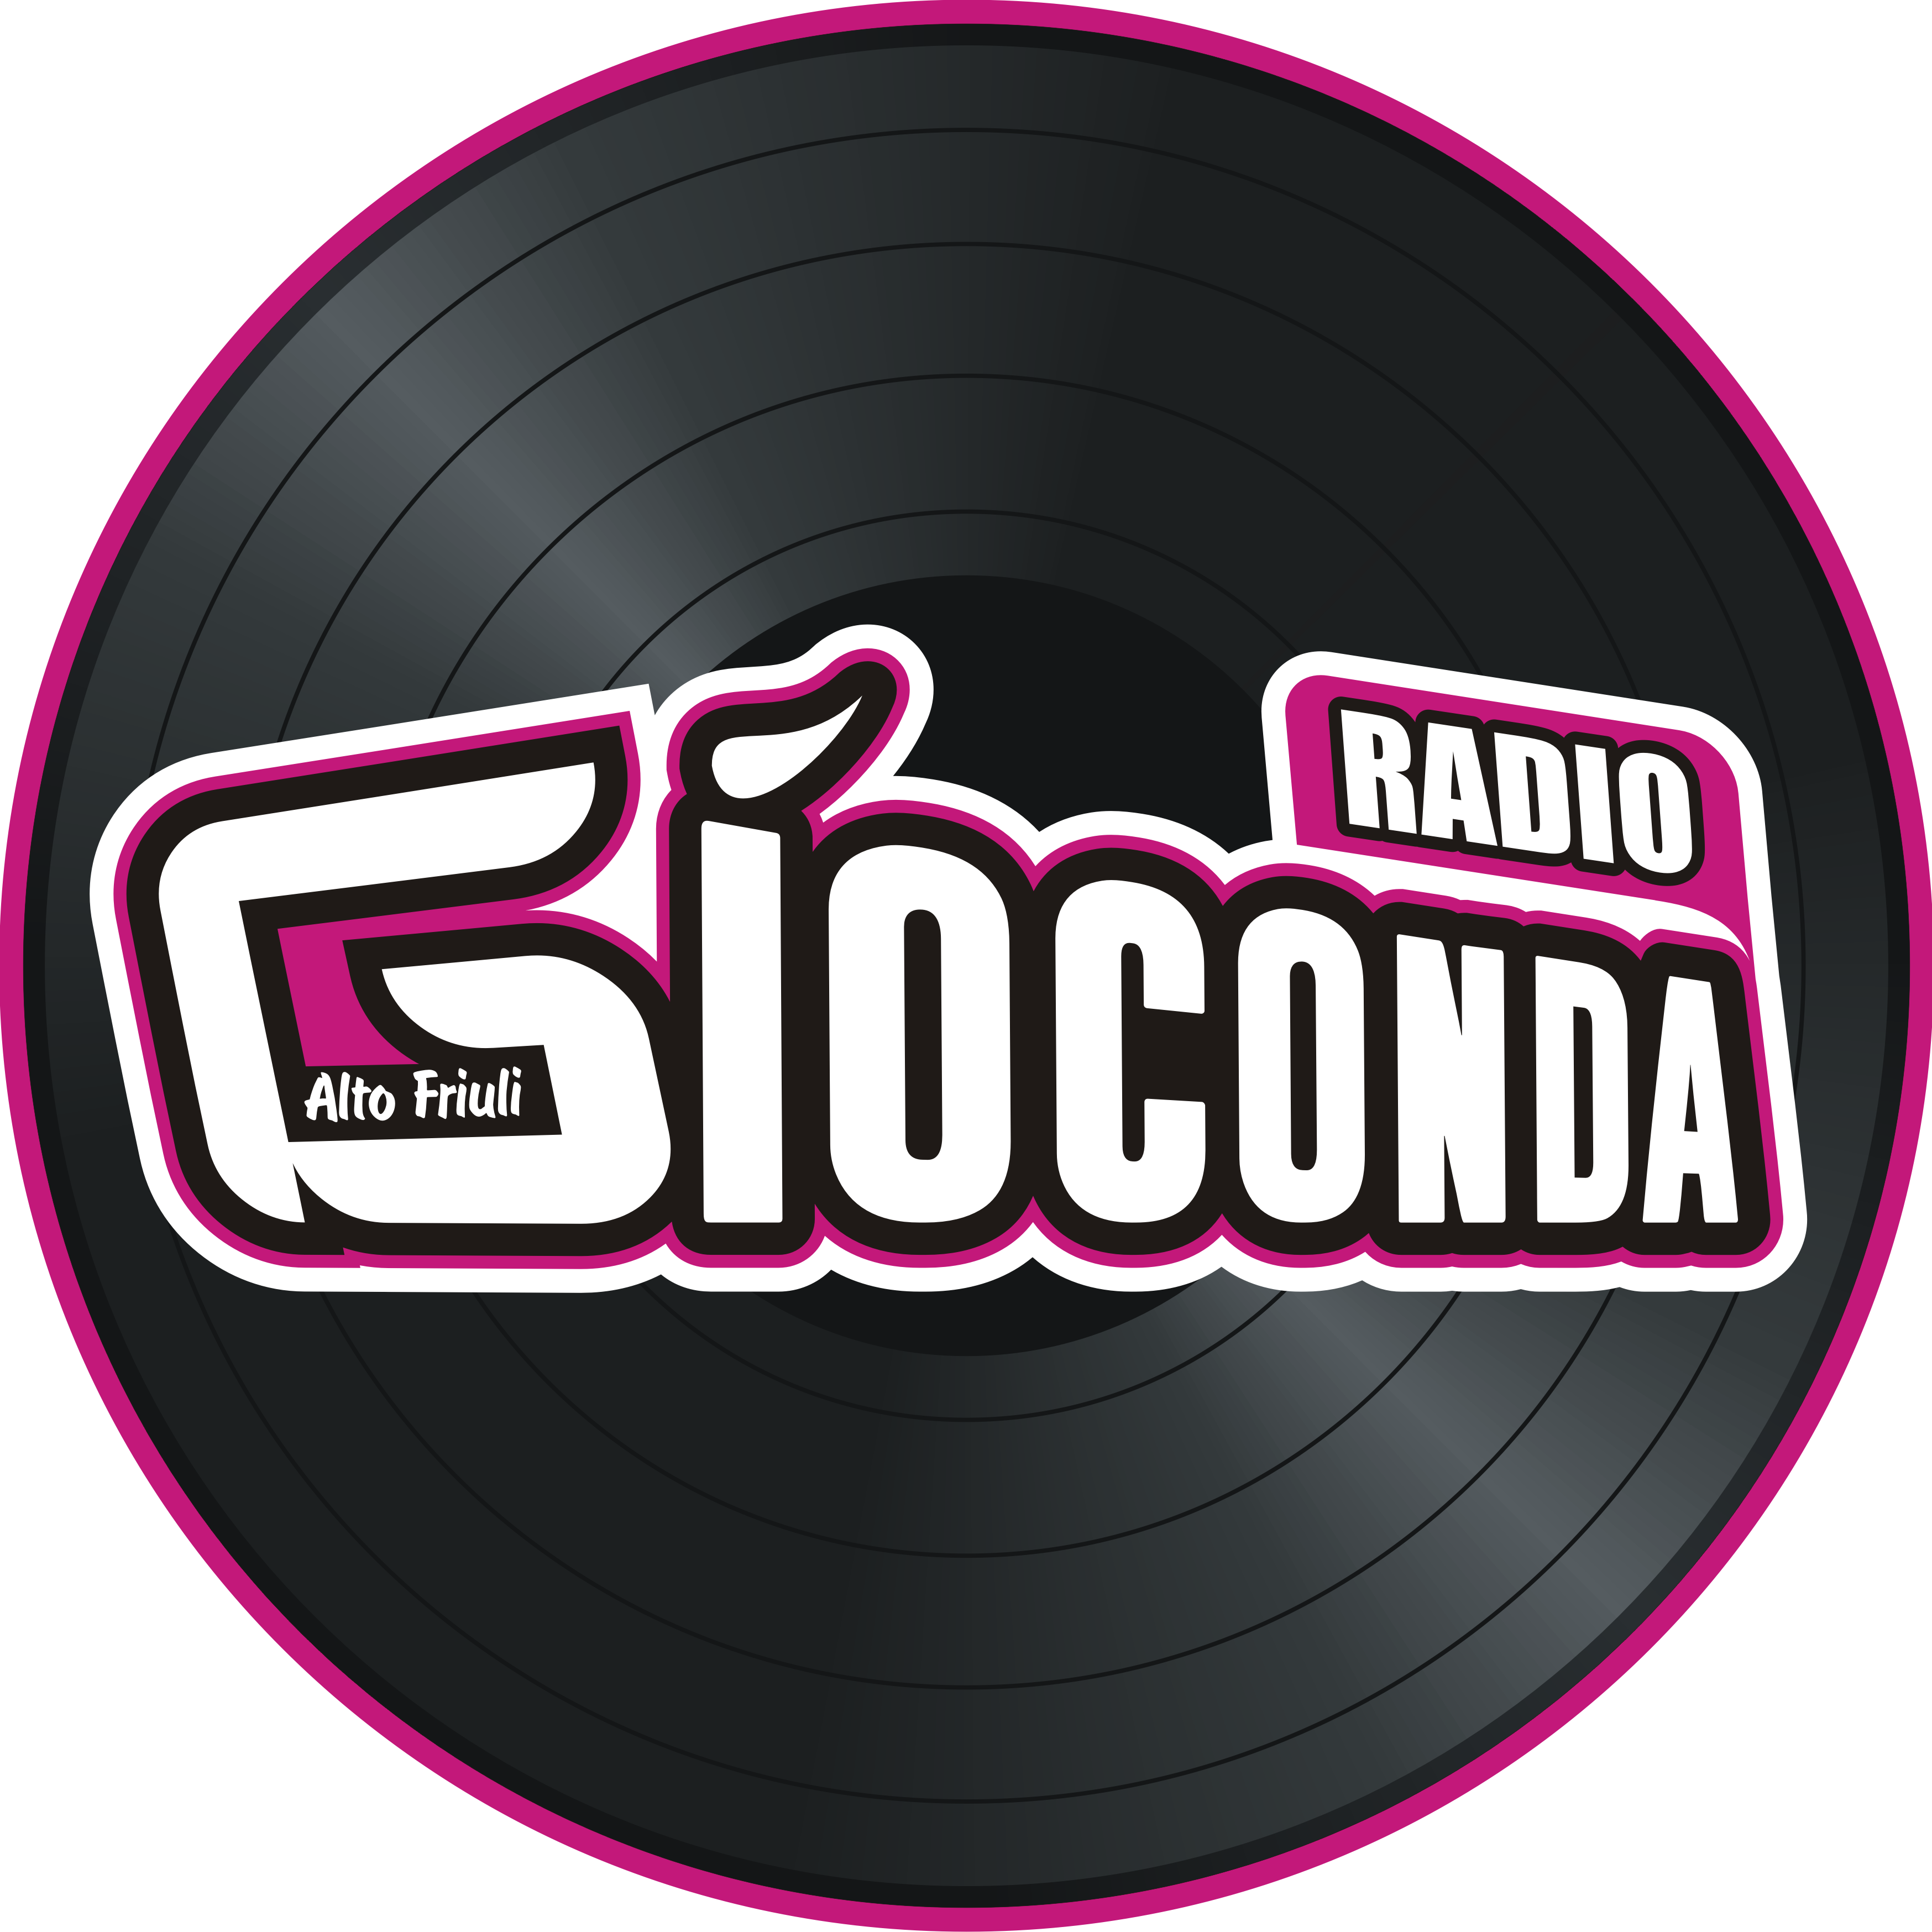 Radio Gioconda Alto Friuli